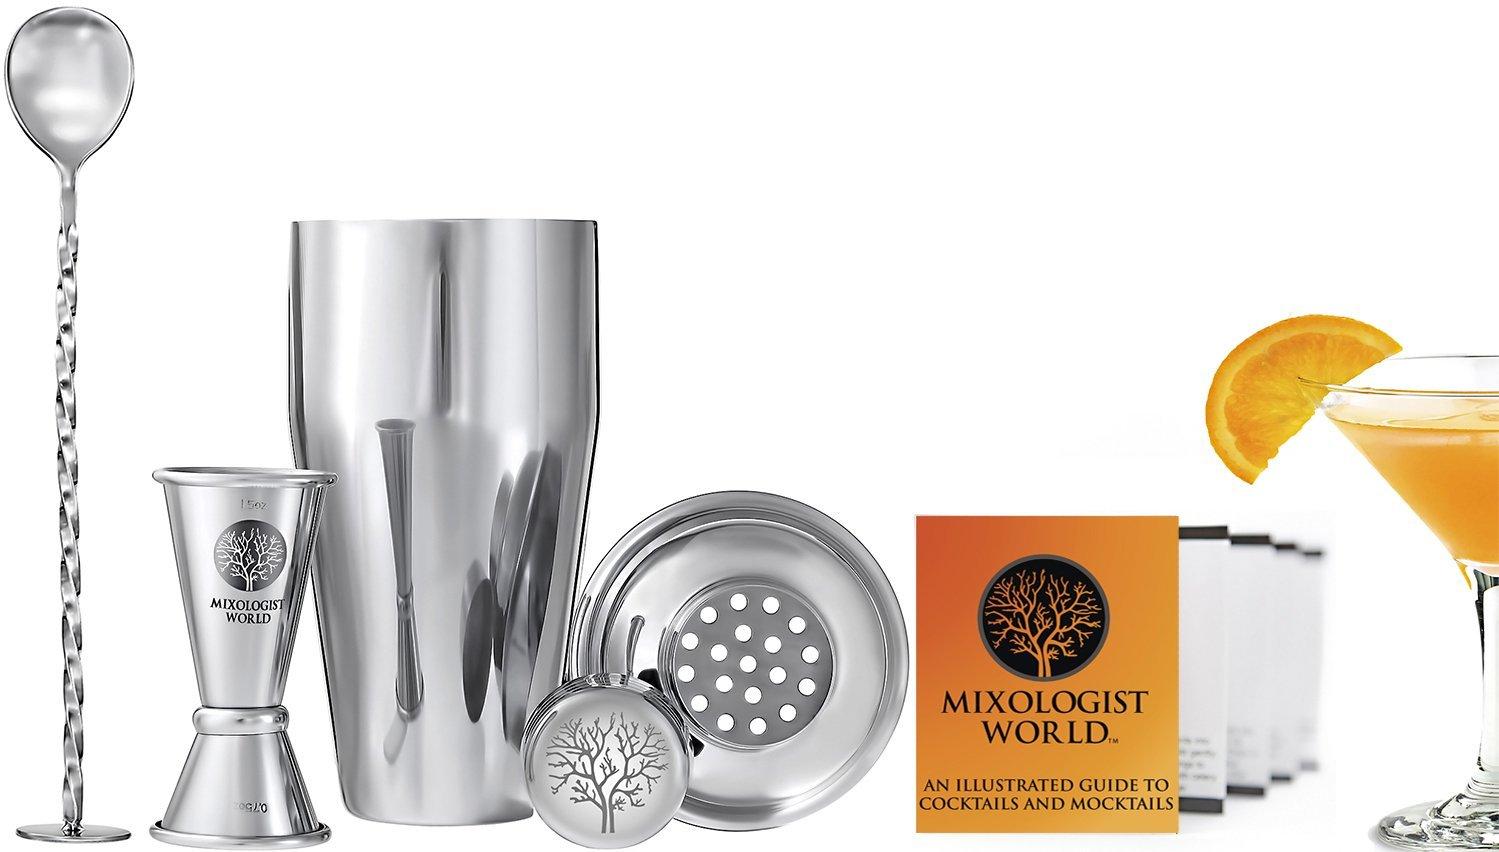 mixologist world cocktail shaker set